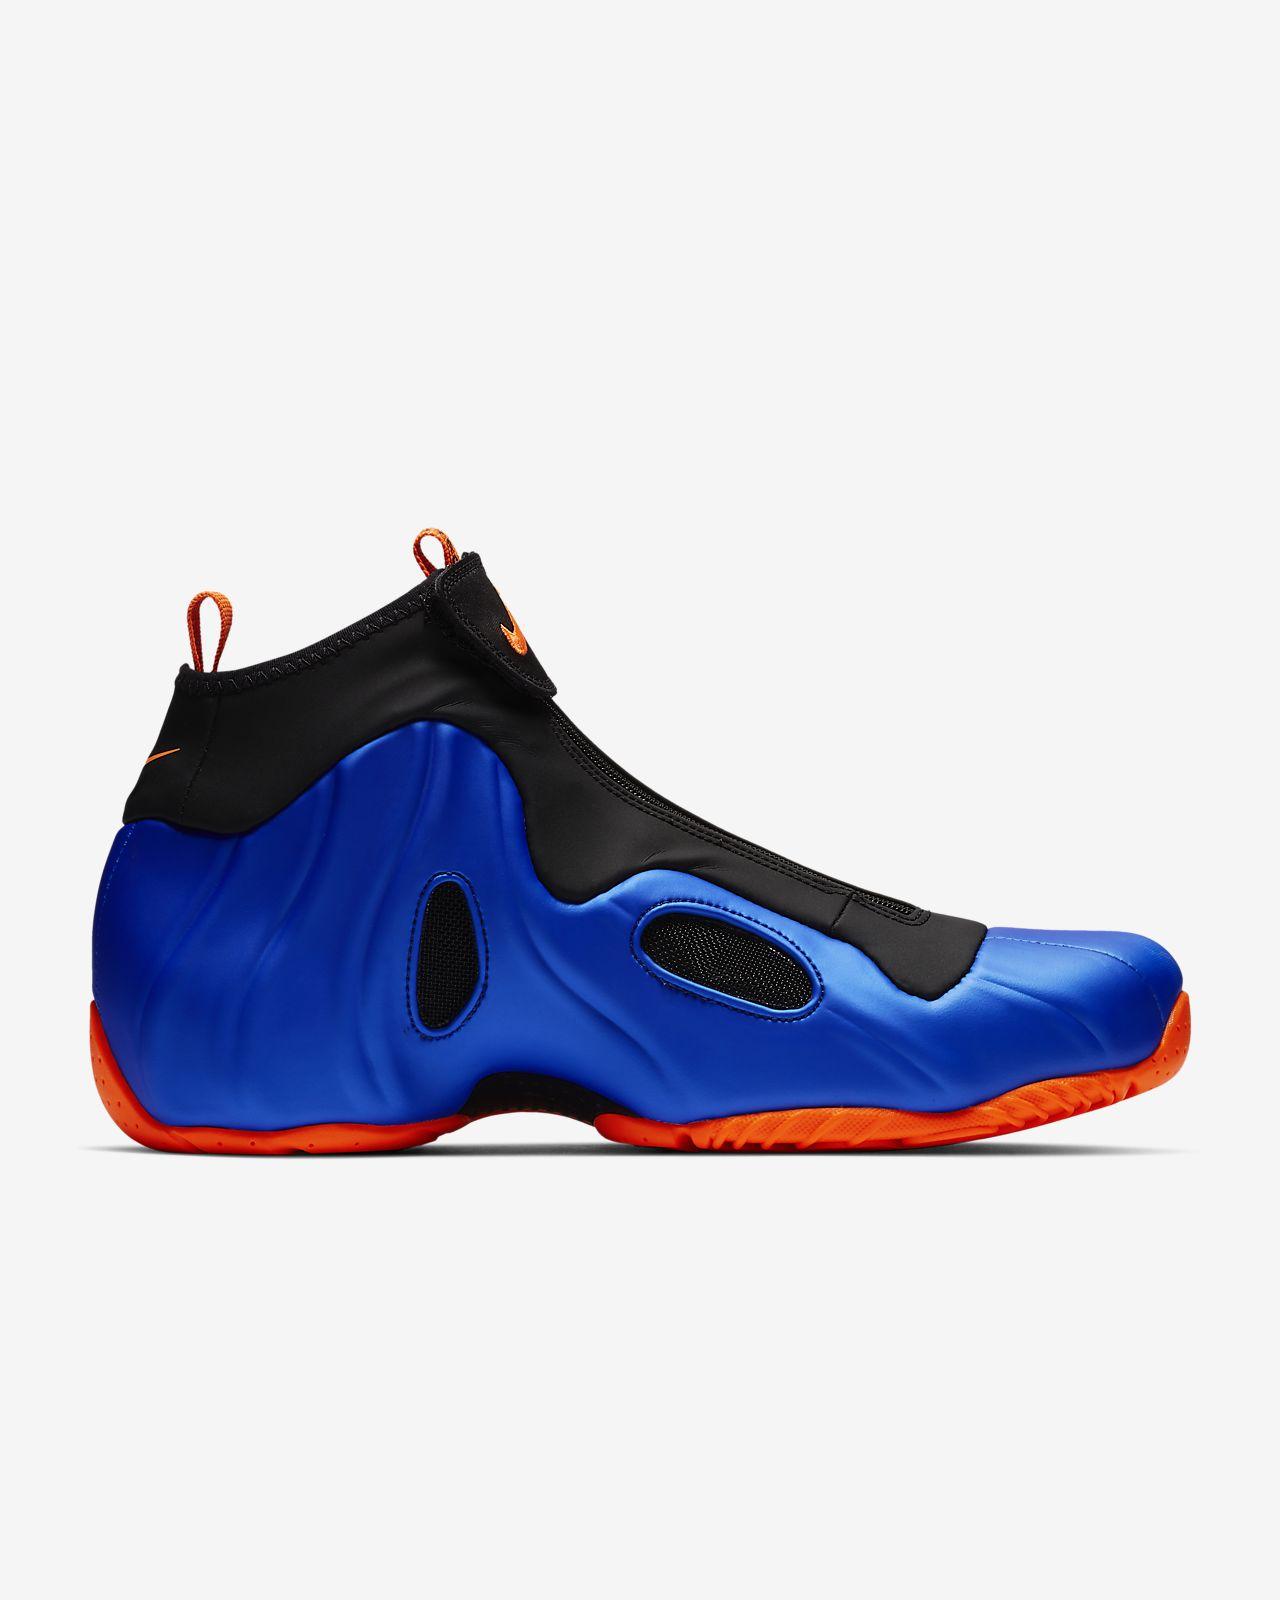 newest 2dd62 b4bb3 Nike Air Flightposite Men's Shoe. Nike.com